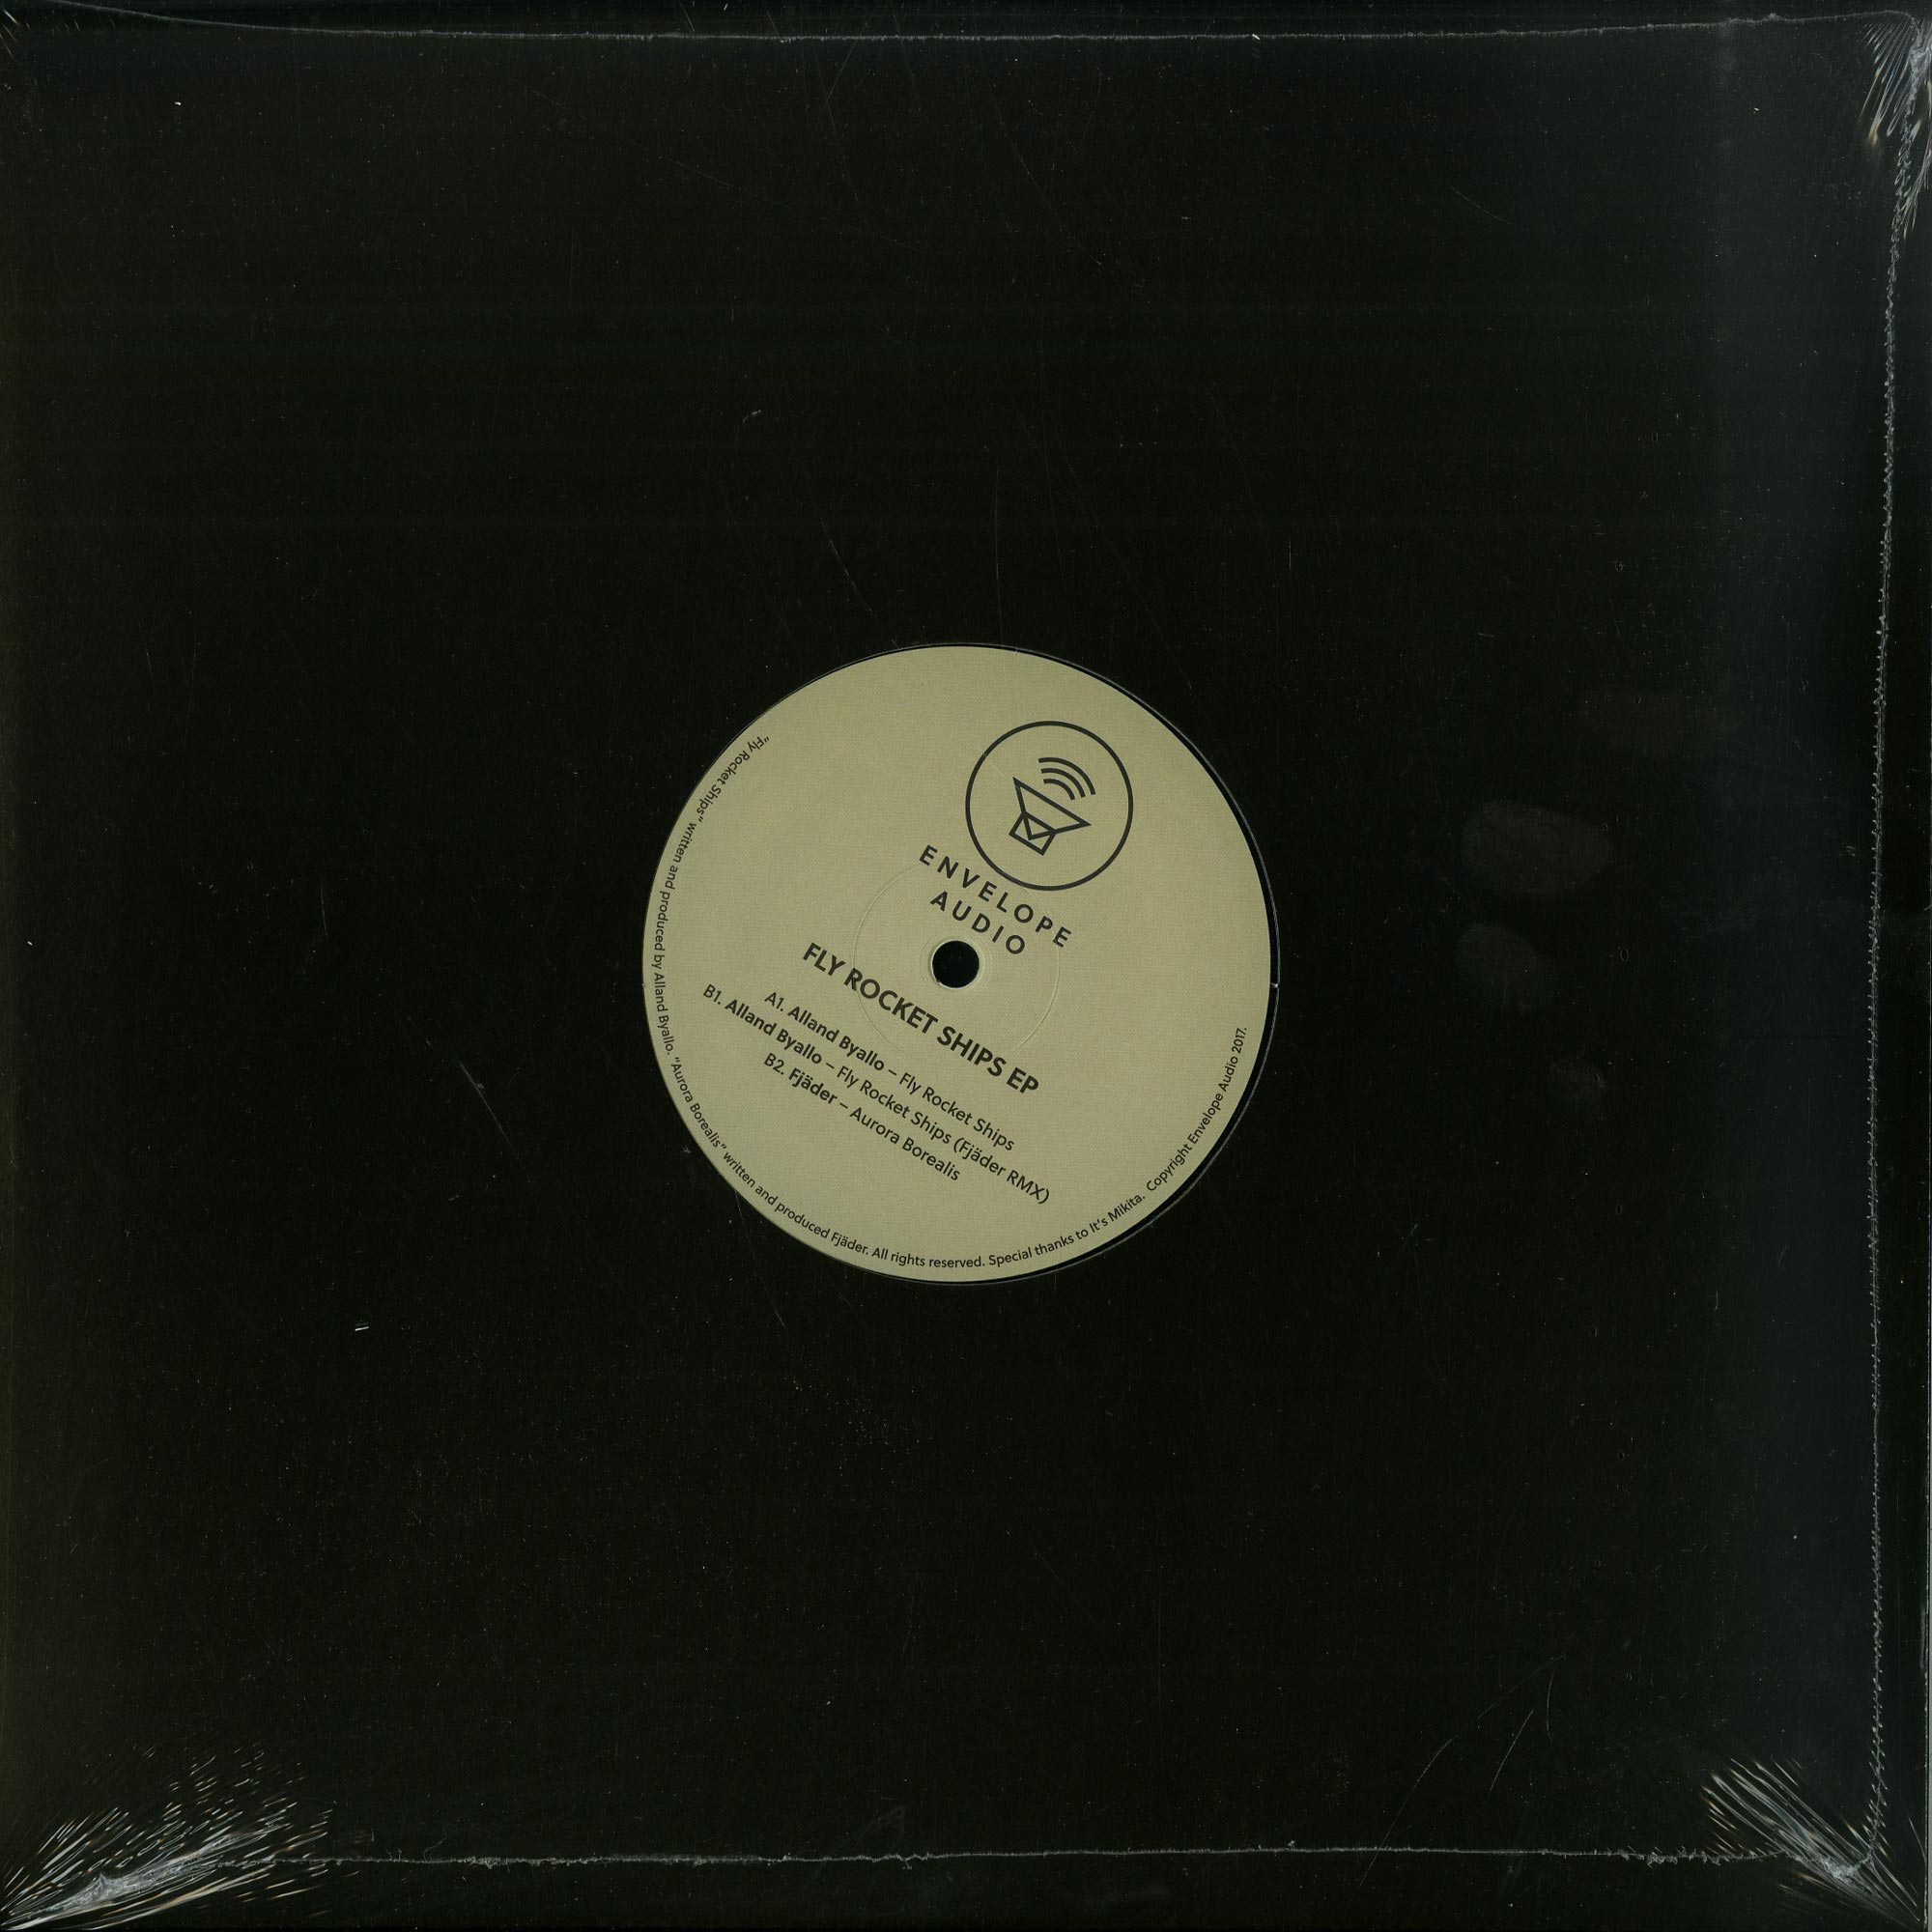 Alland Byallo / Fjaeder - FLY ROCKET SHIPS EP